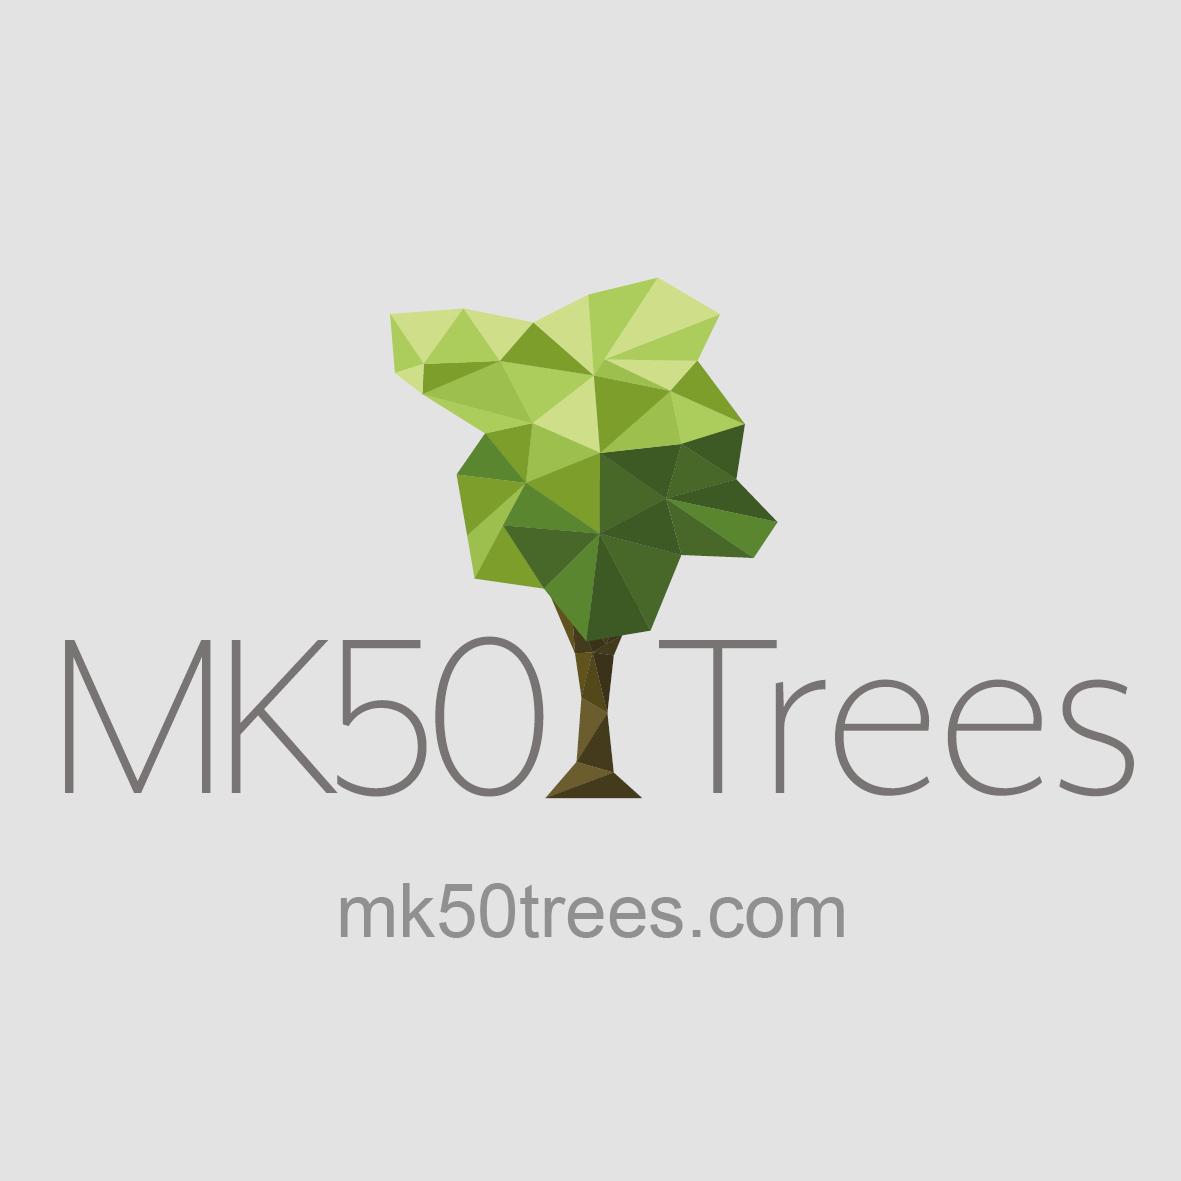 Tree logo square